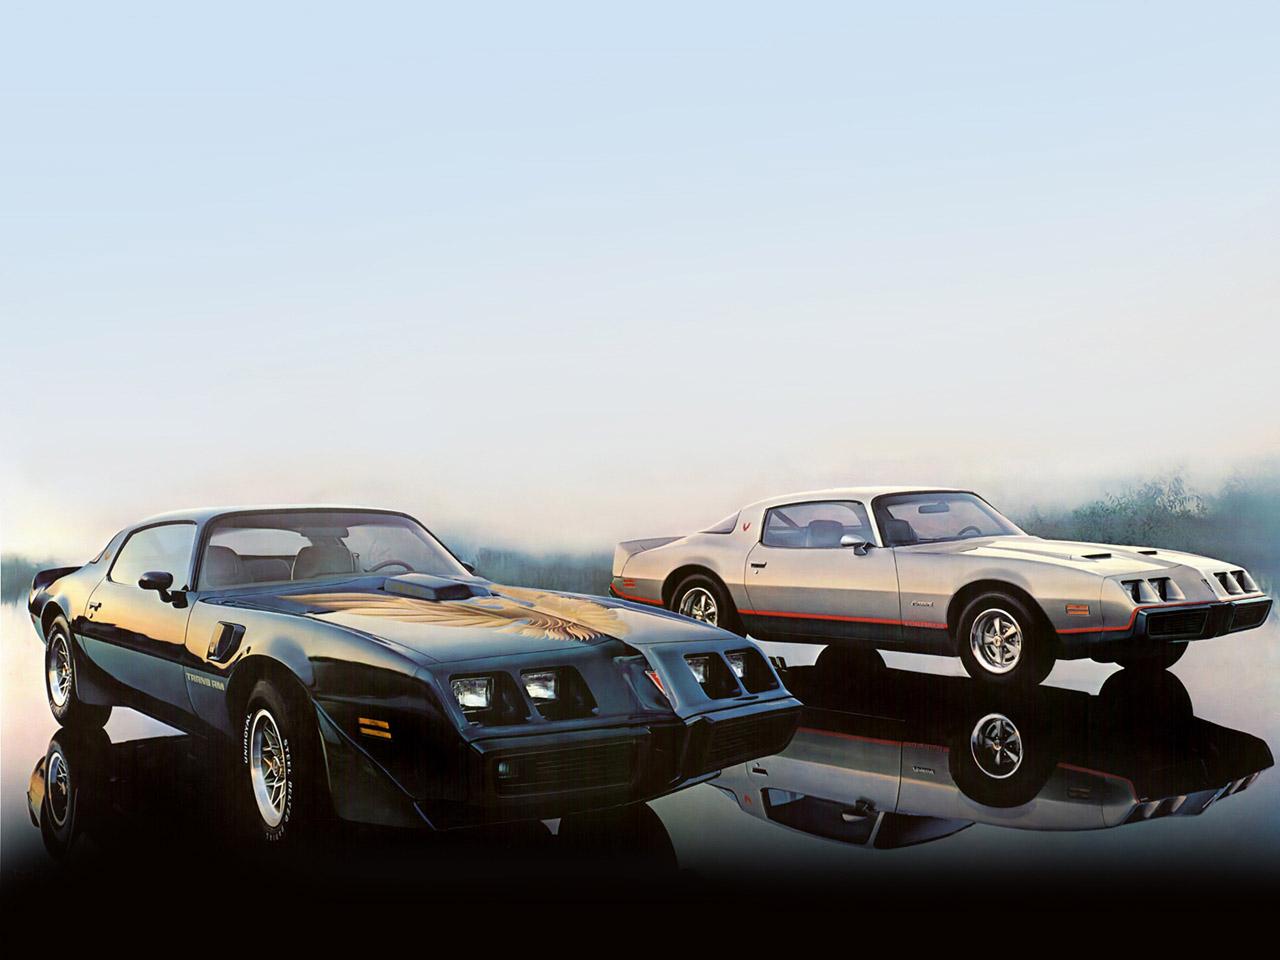 1979 chevy impala 2 door